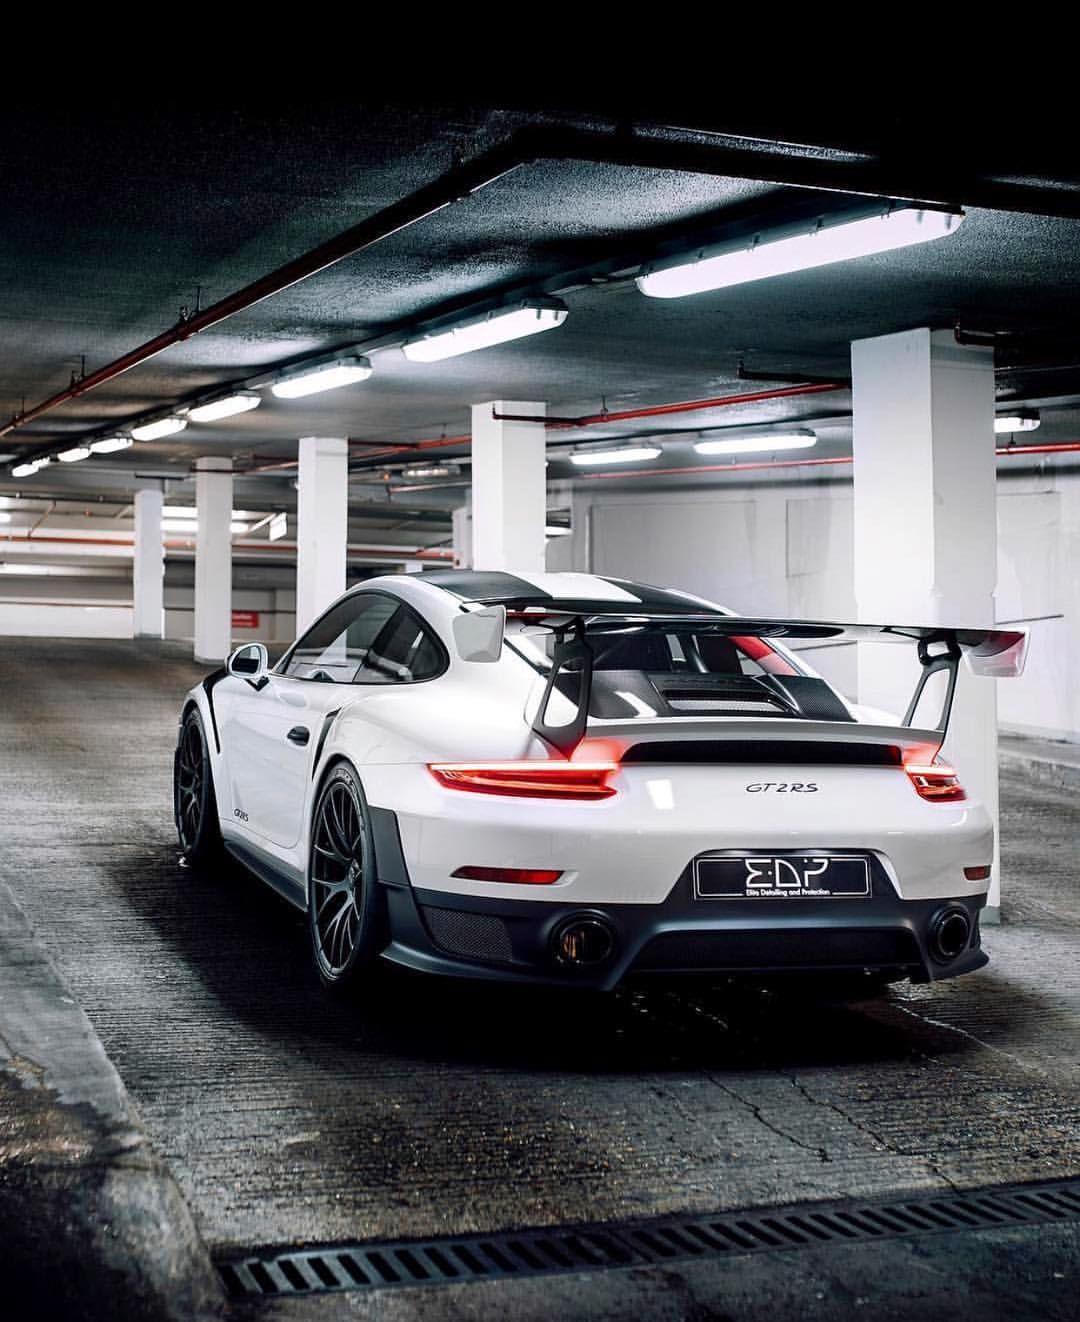 Current Porsche Models: New Bicolore Details 🔥‼️ #Porsche #Gt2rs #Wing #Exhaust